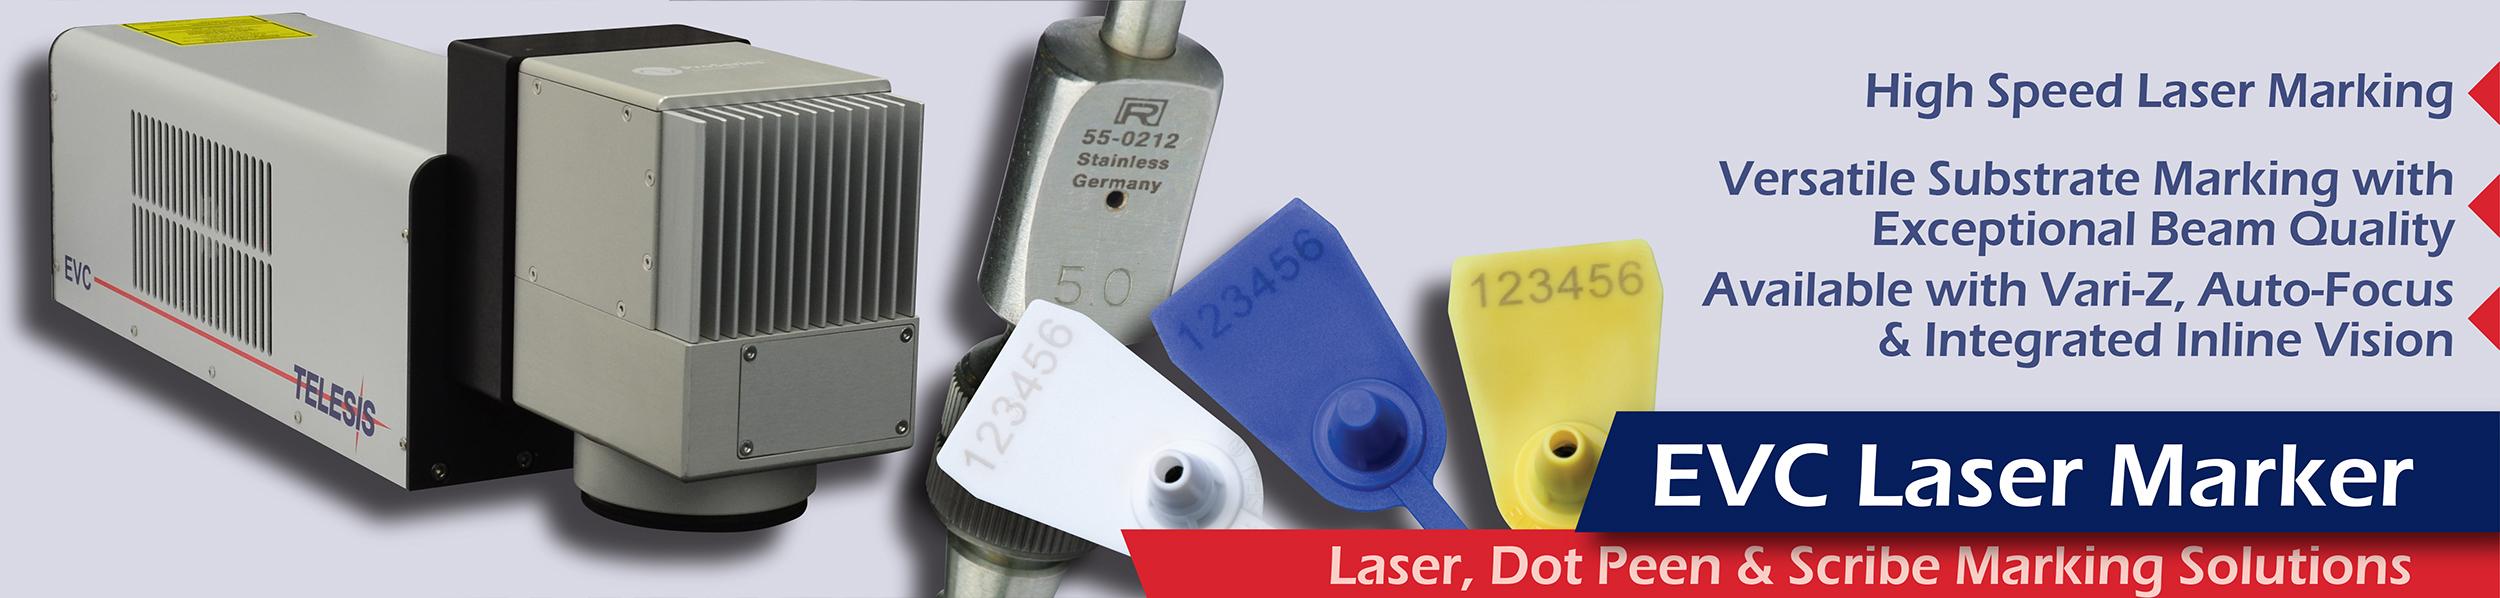 EVC Laser Marking System